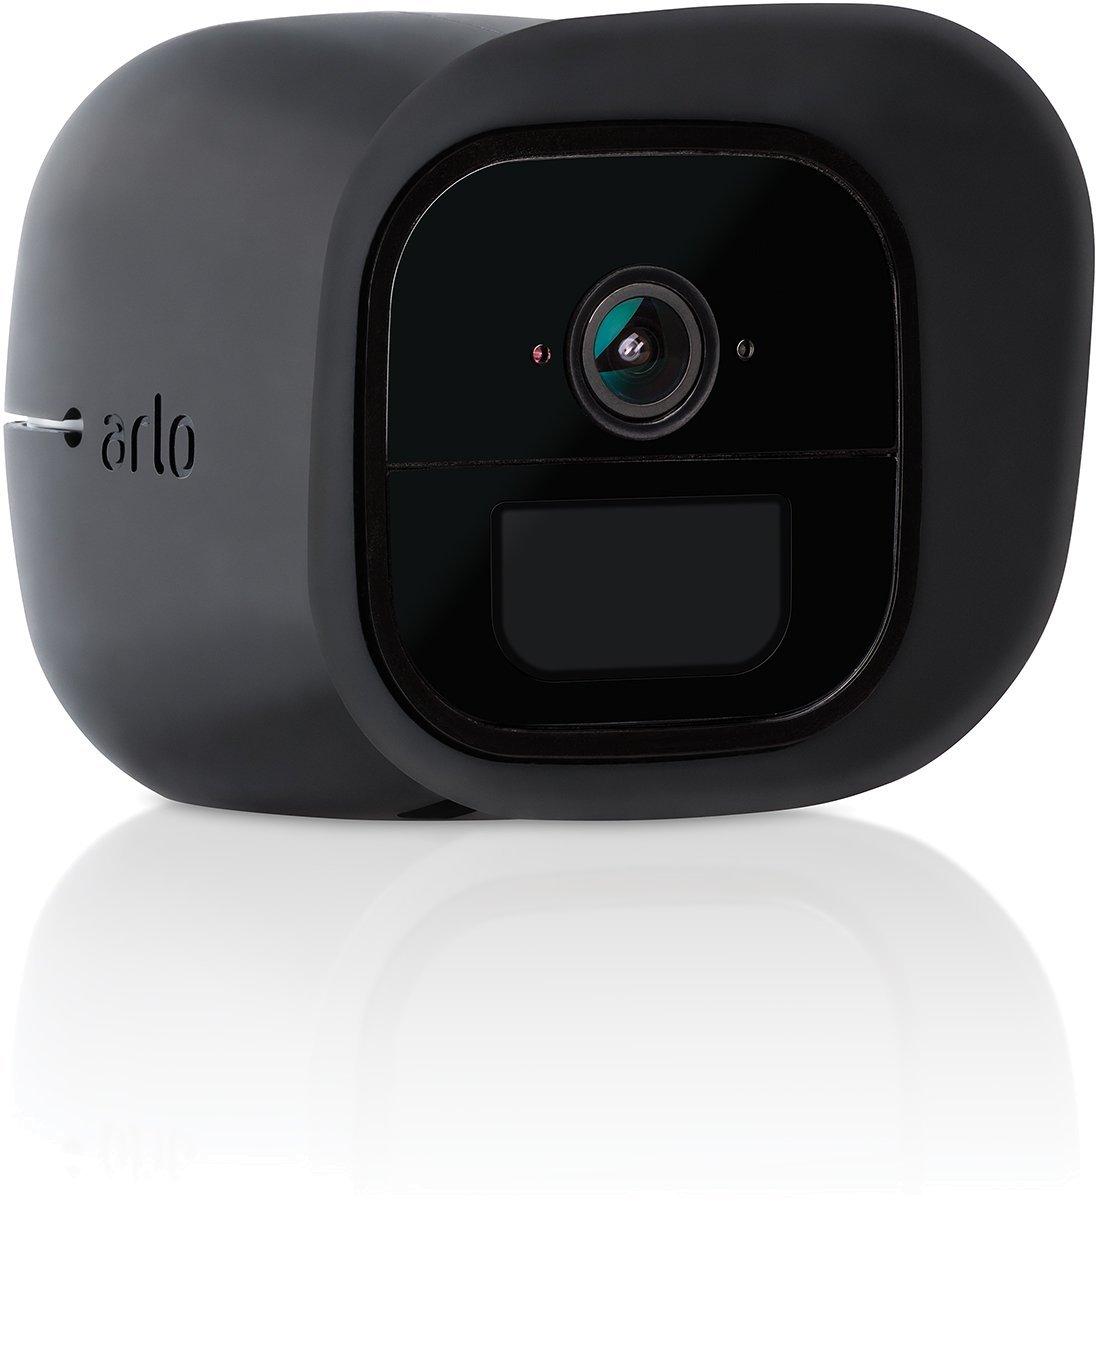 VMA1200B Arlo Accesorio oficial Color Negro Kit de 3 Fundas de Silicona para c/ámaras de Seguridad y vigilancia Arlo Accesorio oficial